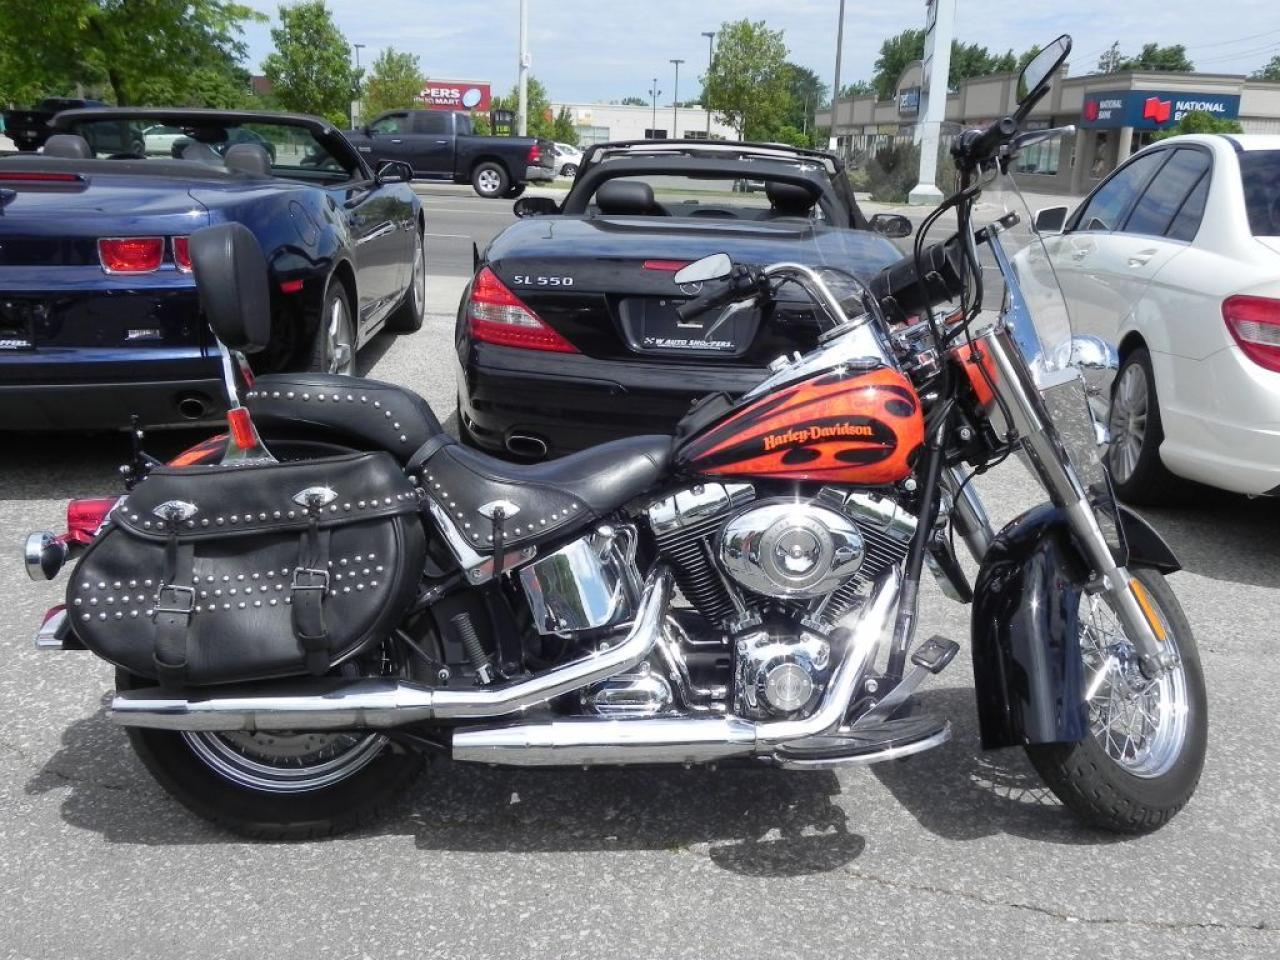 2010 Harley-Davidson Heritage Softail Classic Skull Edition